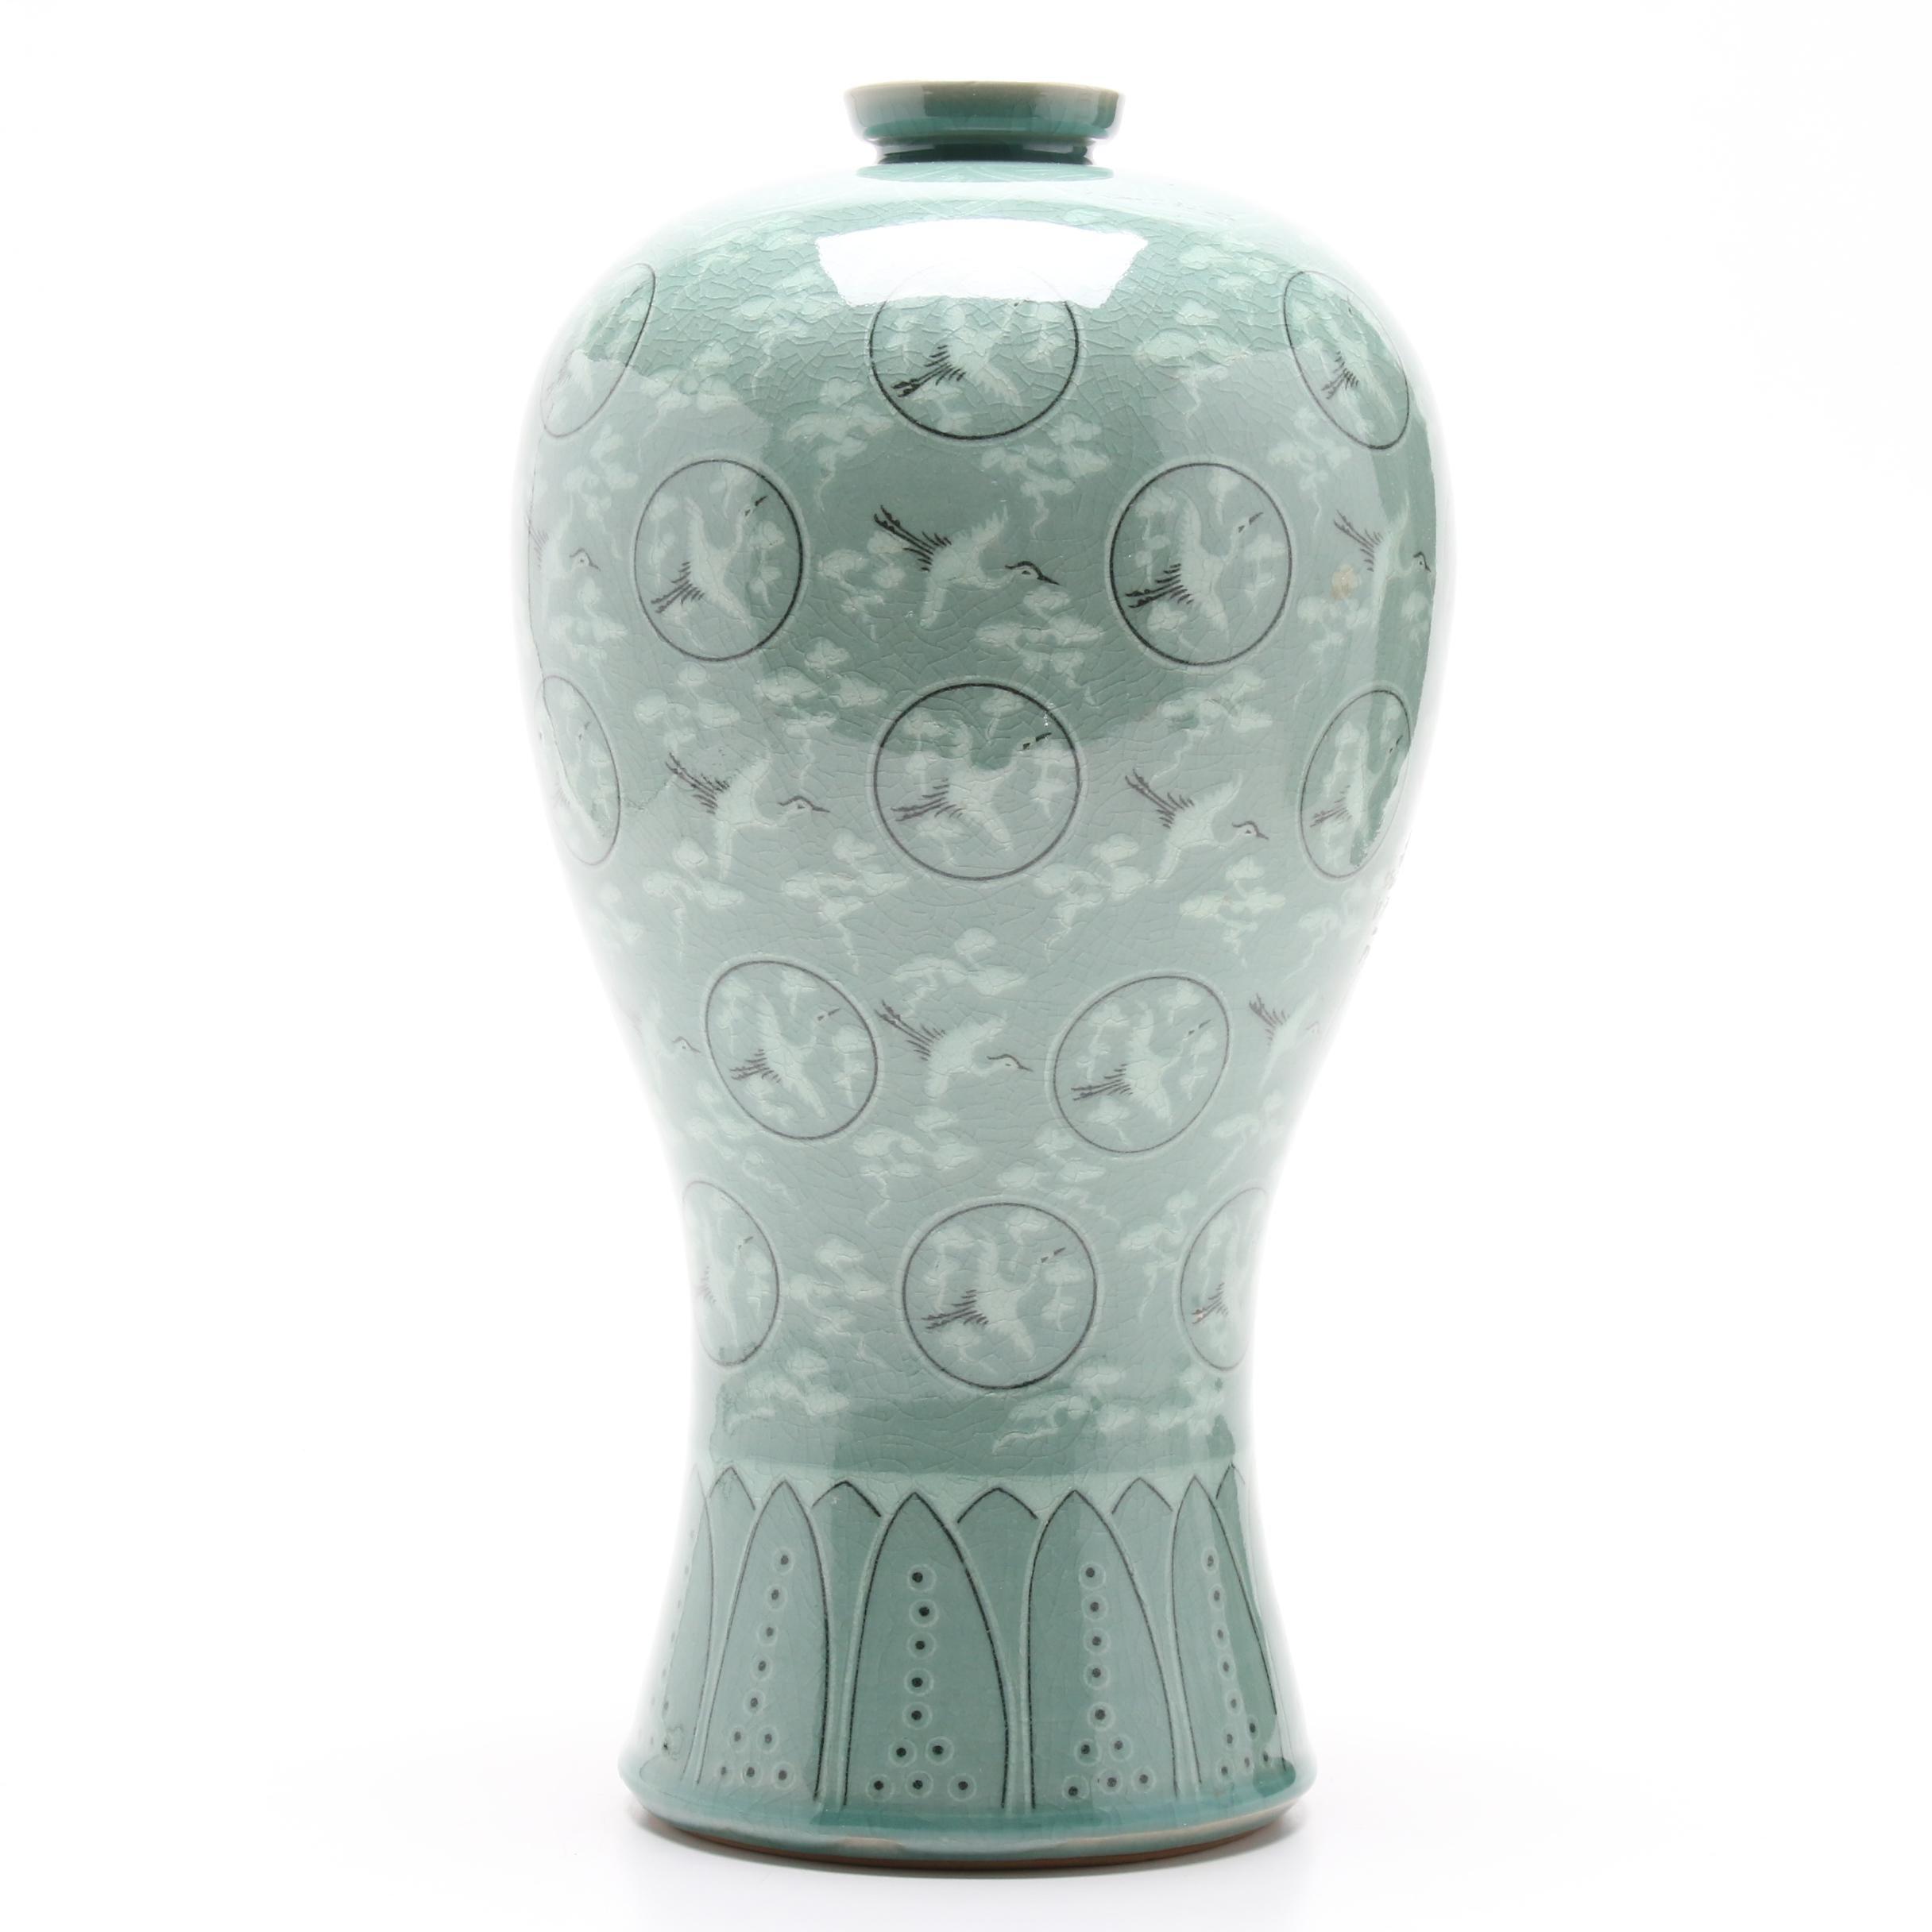 Korean Celadon Cranes Motif Plum Vase